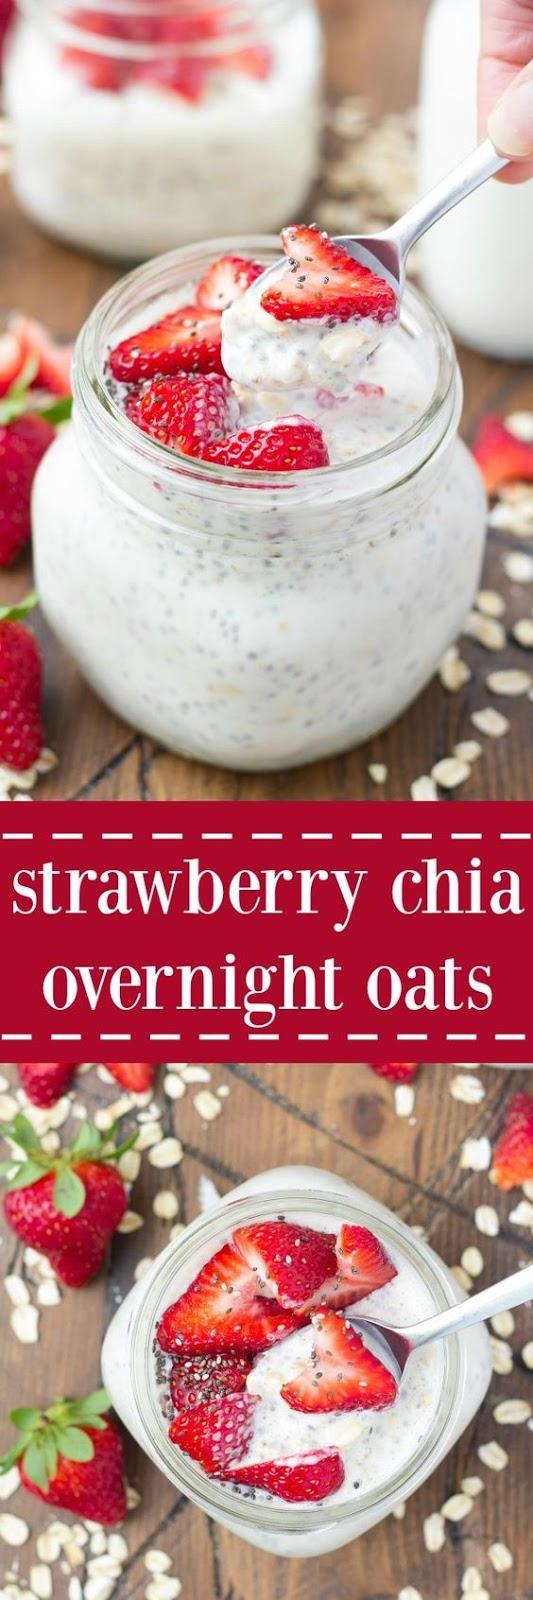 strawberry chia overnight oats